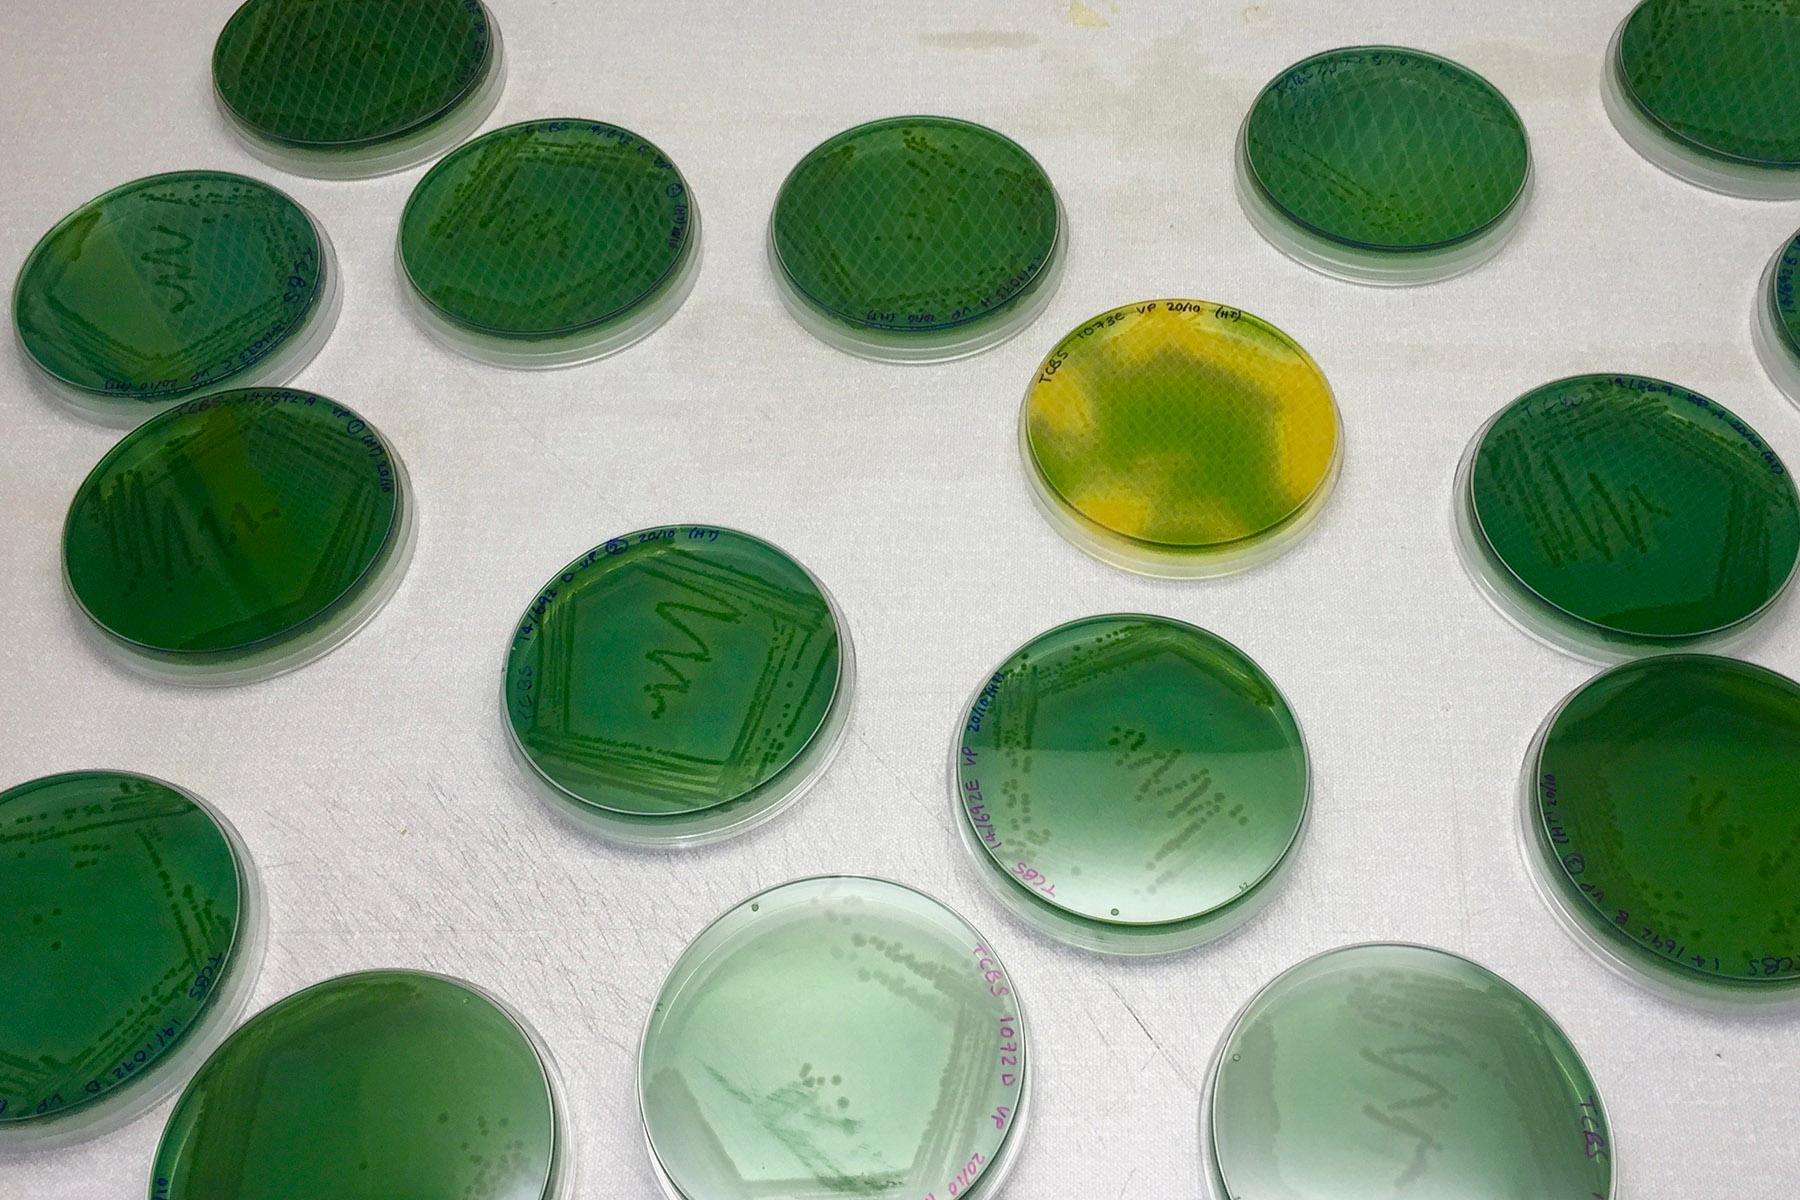 Chesapeake Bay Bacteria